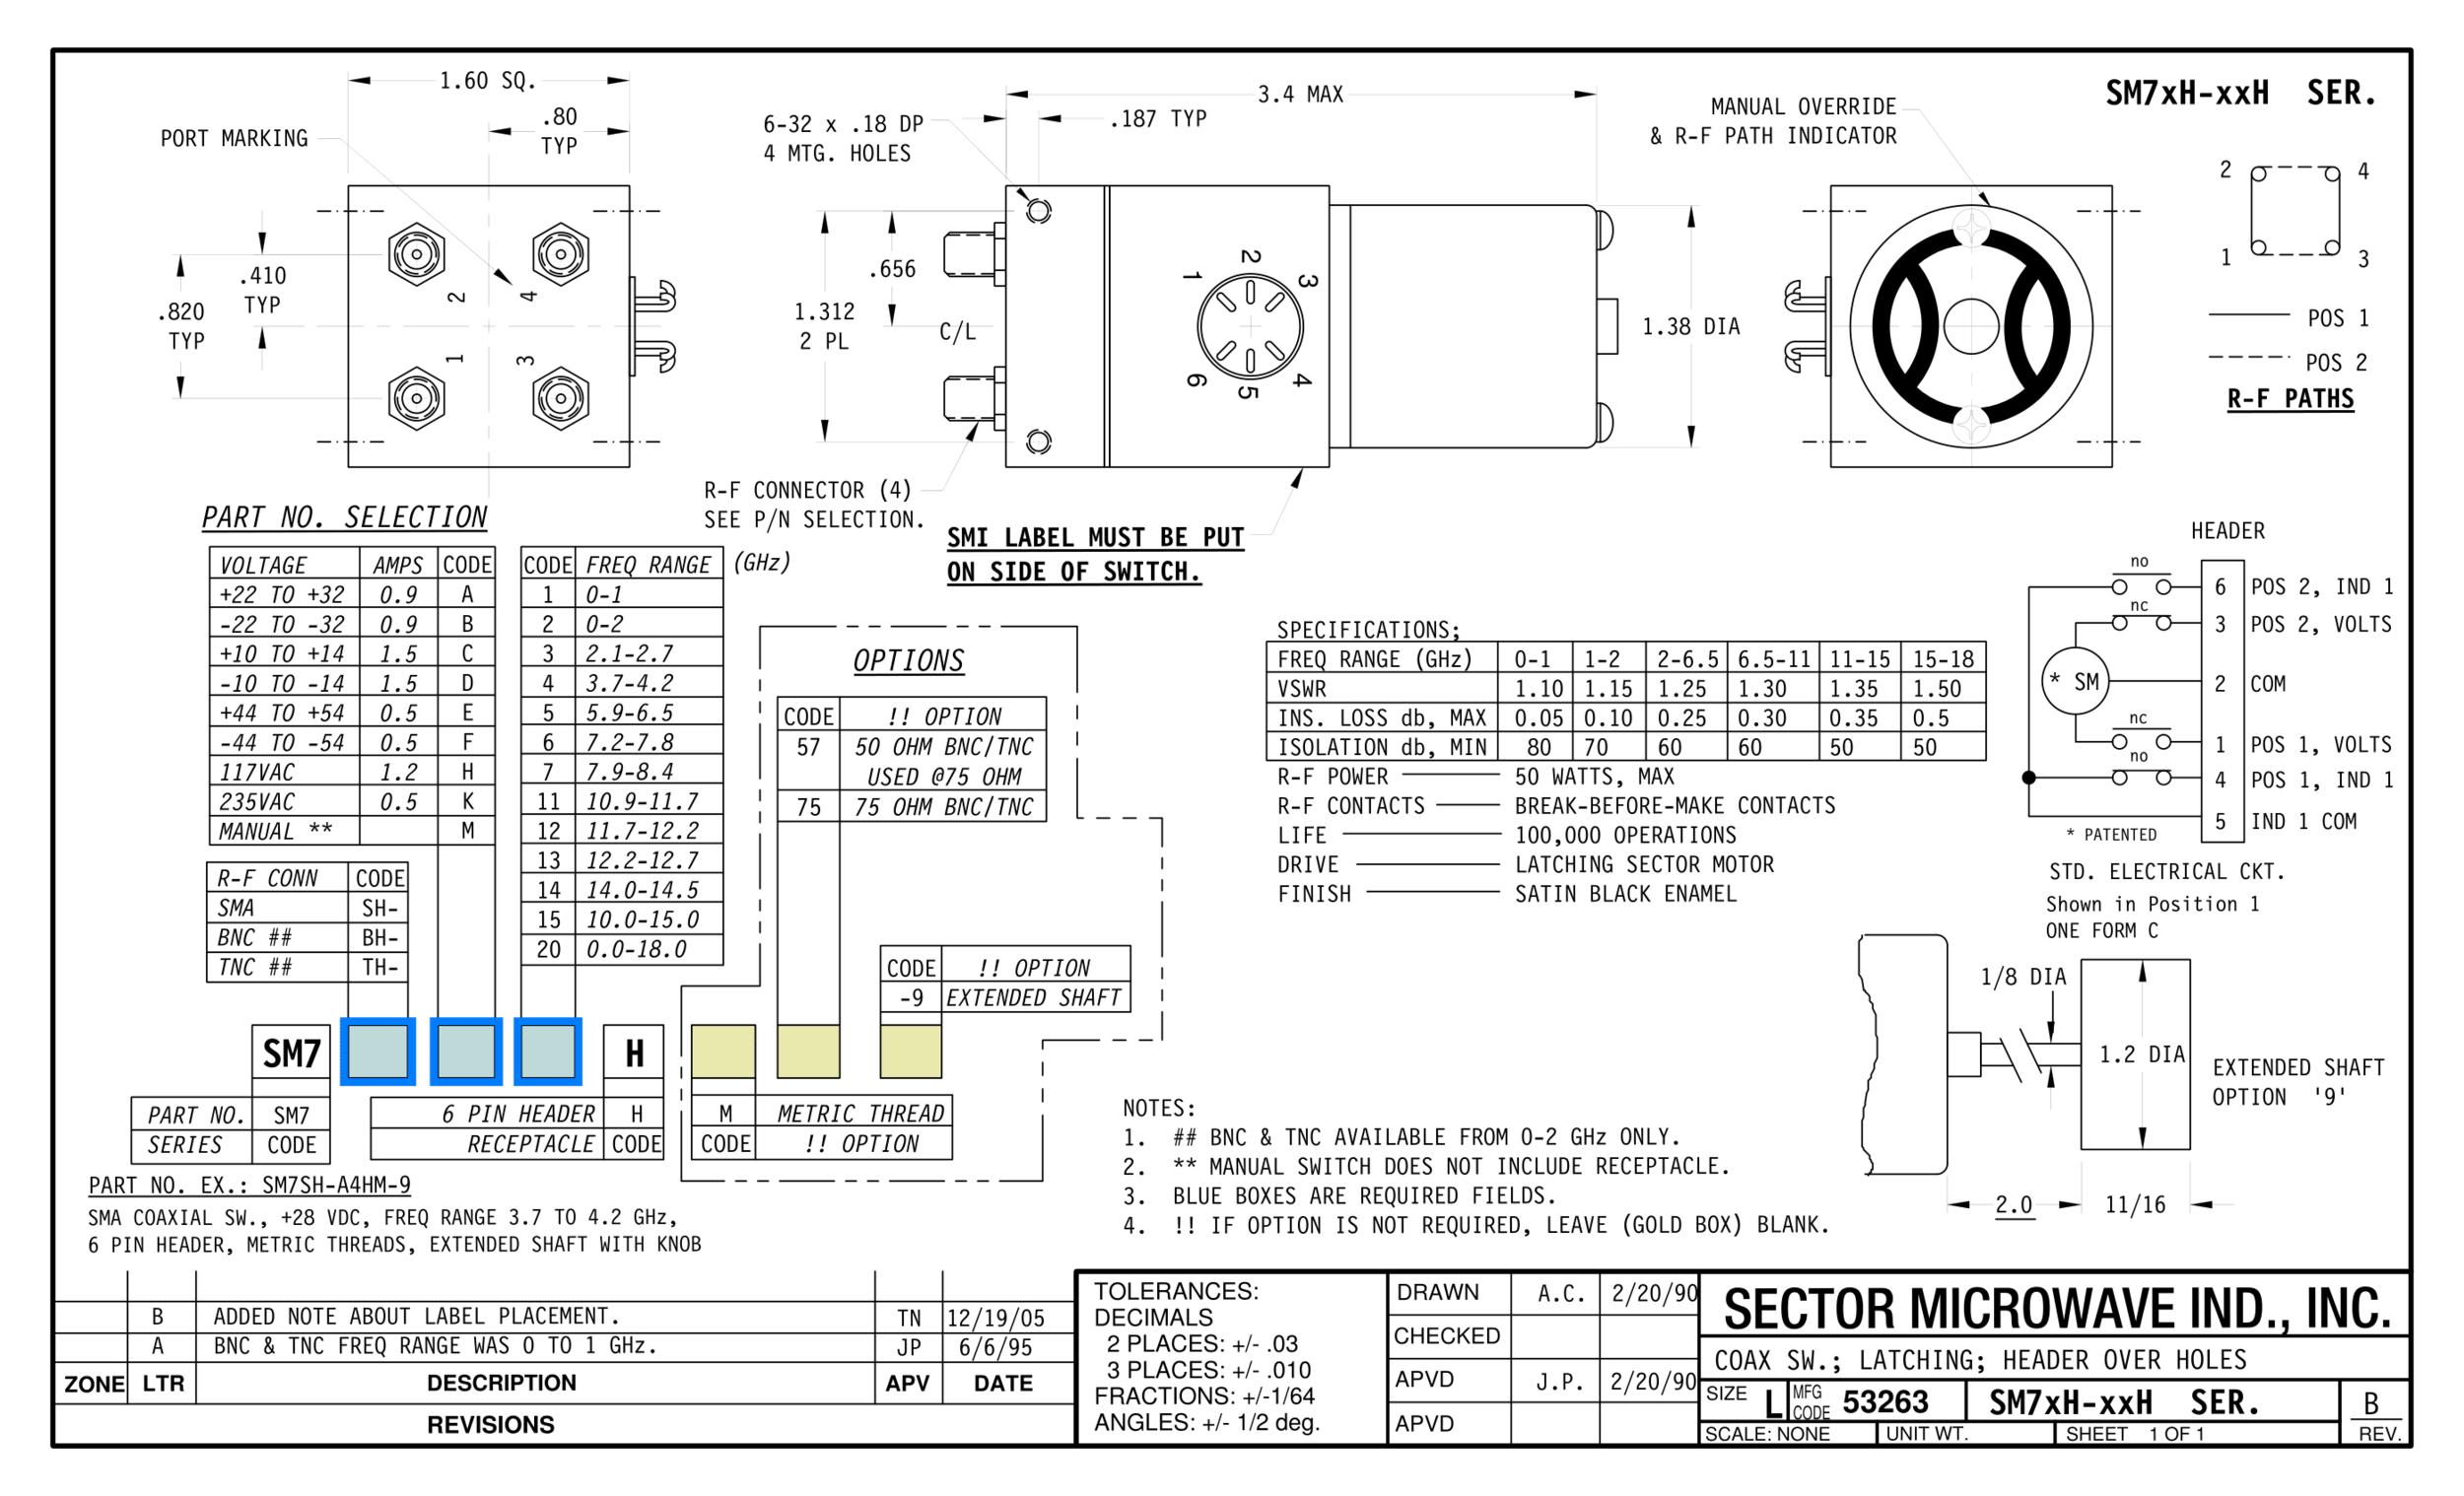 SM7H-XXH Standard